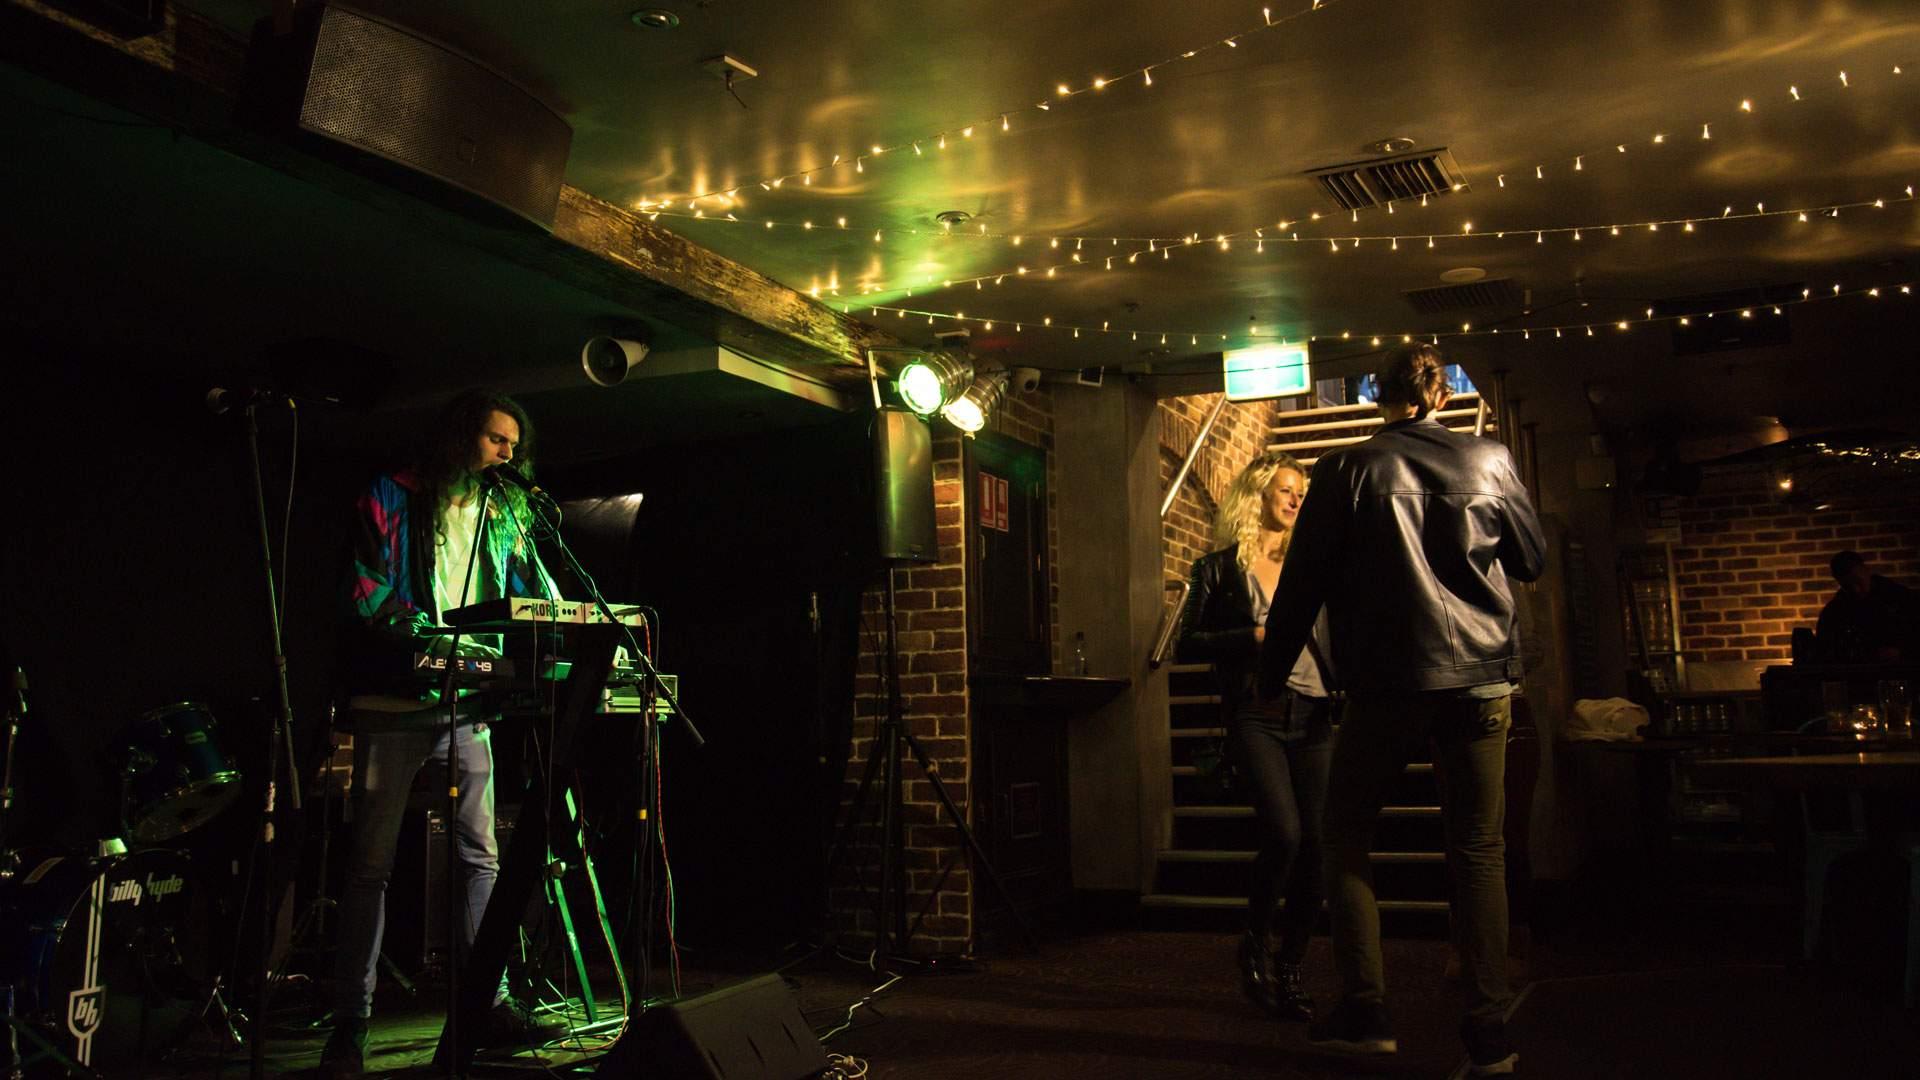 Symposium Is Sydney's New Weekly Underground Music and Arts Night